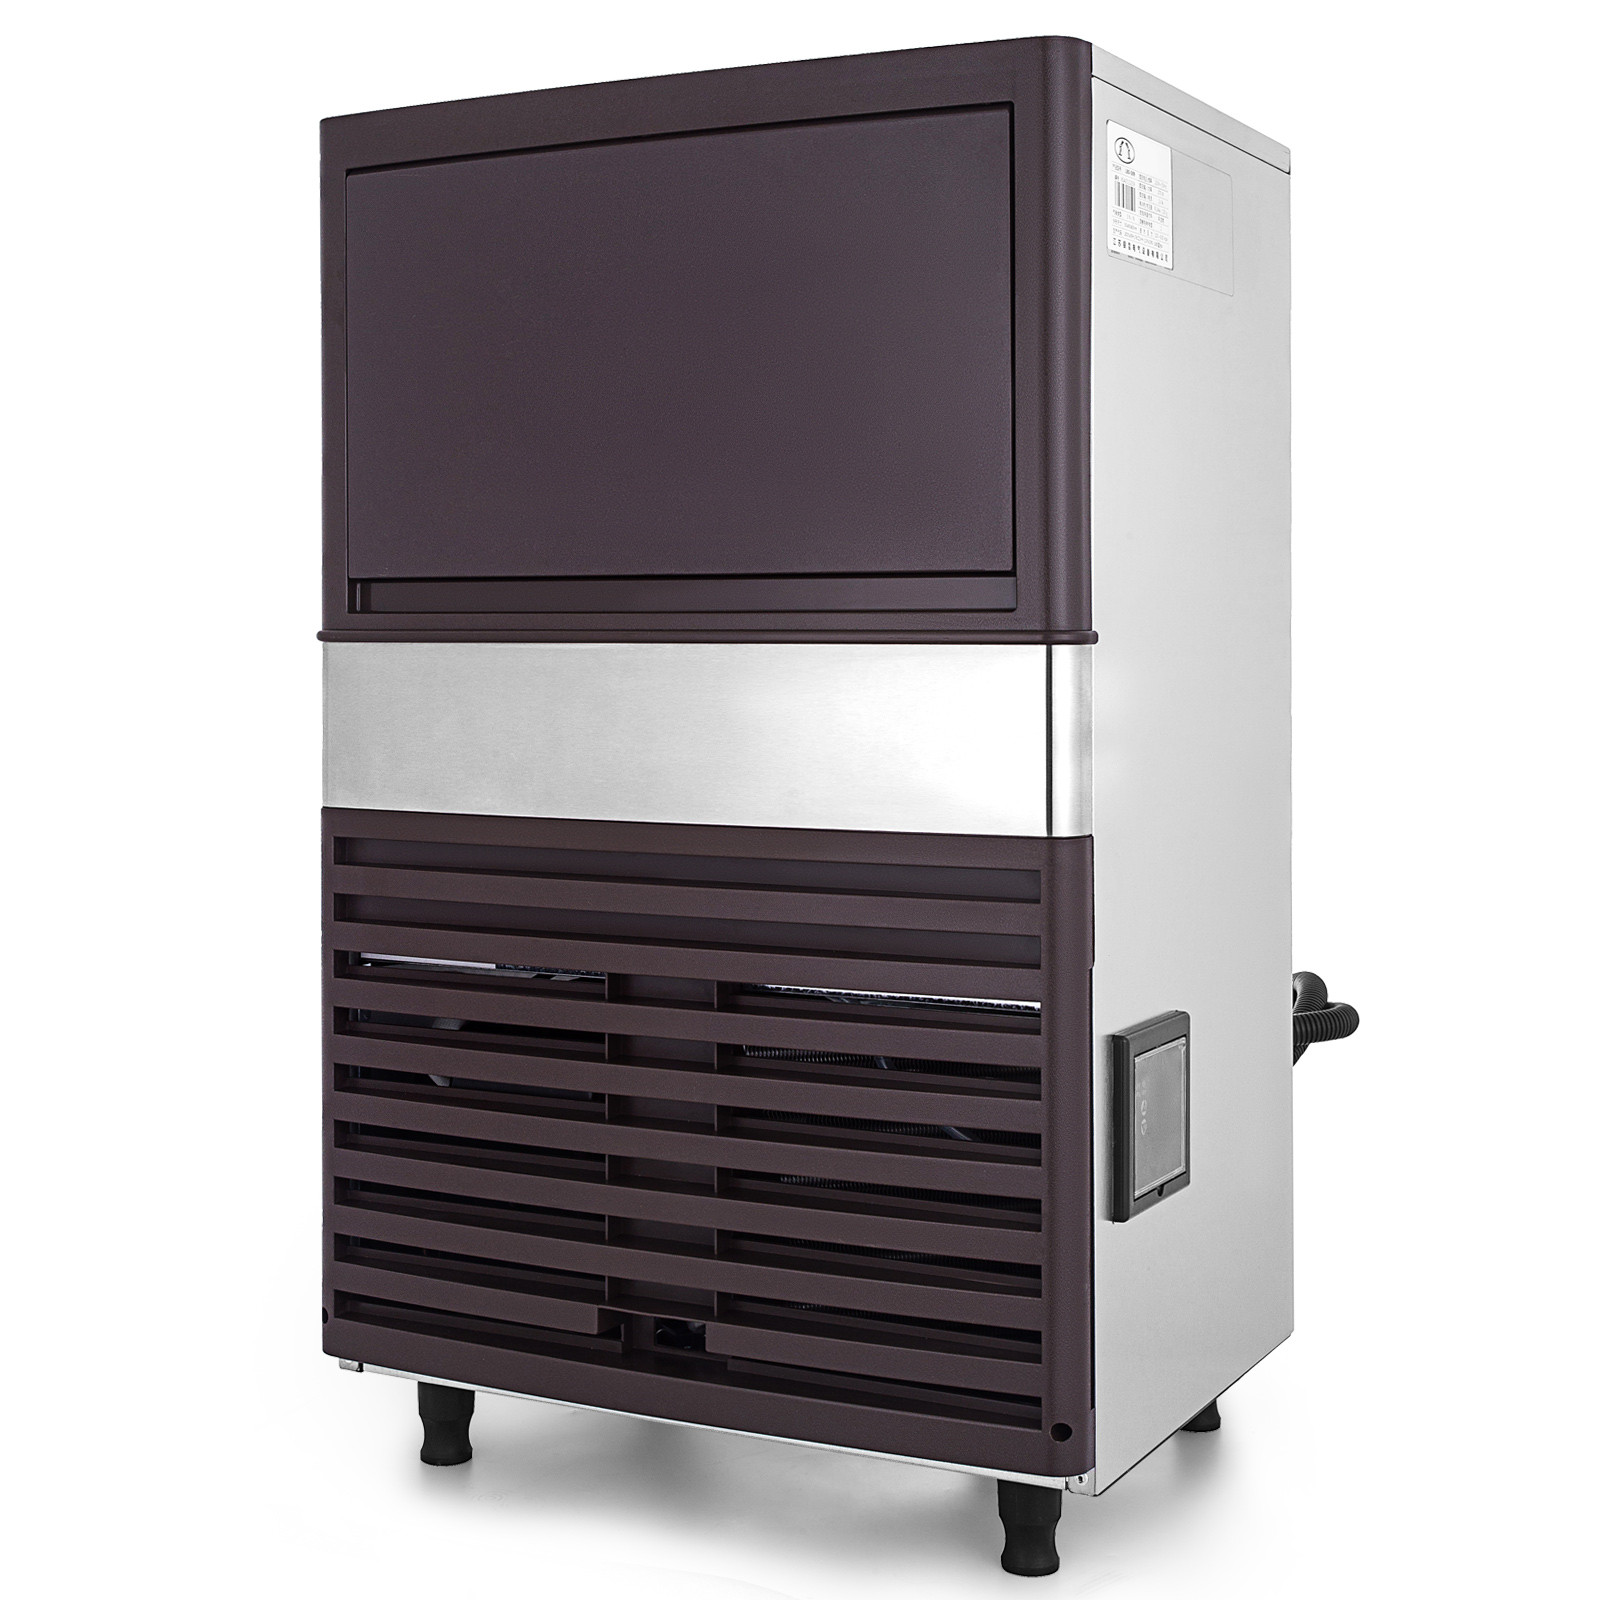 40-55-KG-Intelligent-Ice-Cube-Making-Machine-Bars-Heat-Insulation-Ice-Spoon thumbnail 42